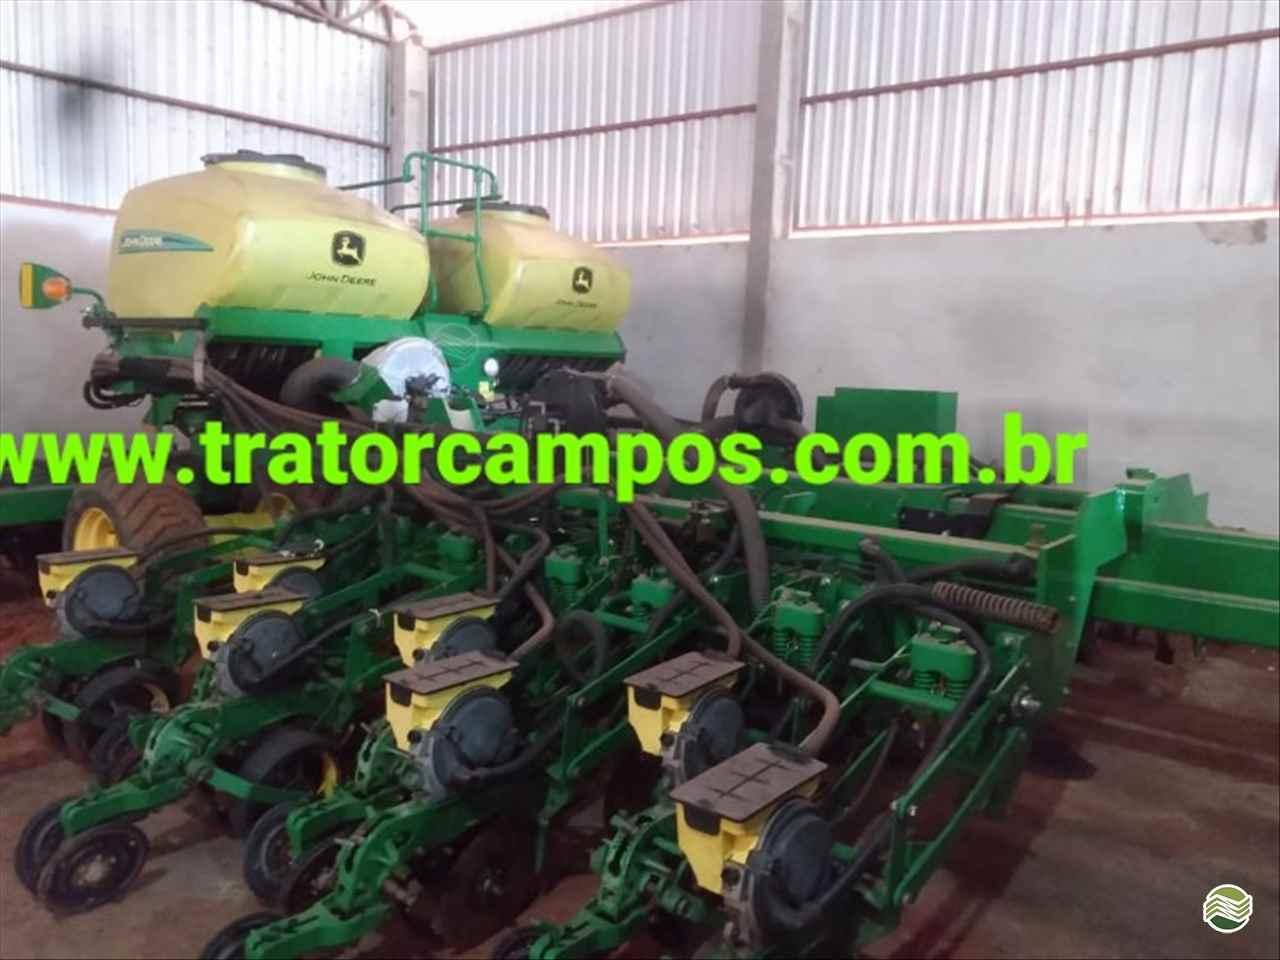 PLANTADEIRA JOHN DEERE PLANTADEIRAS DB40 Trator Campos GUAPO GOIAS GO